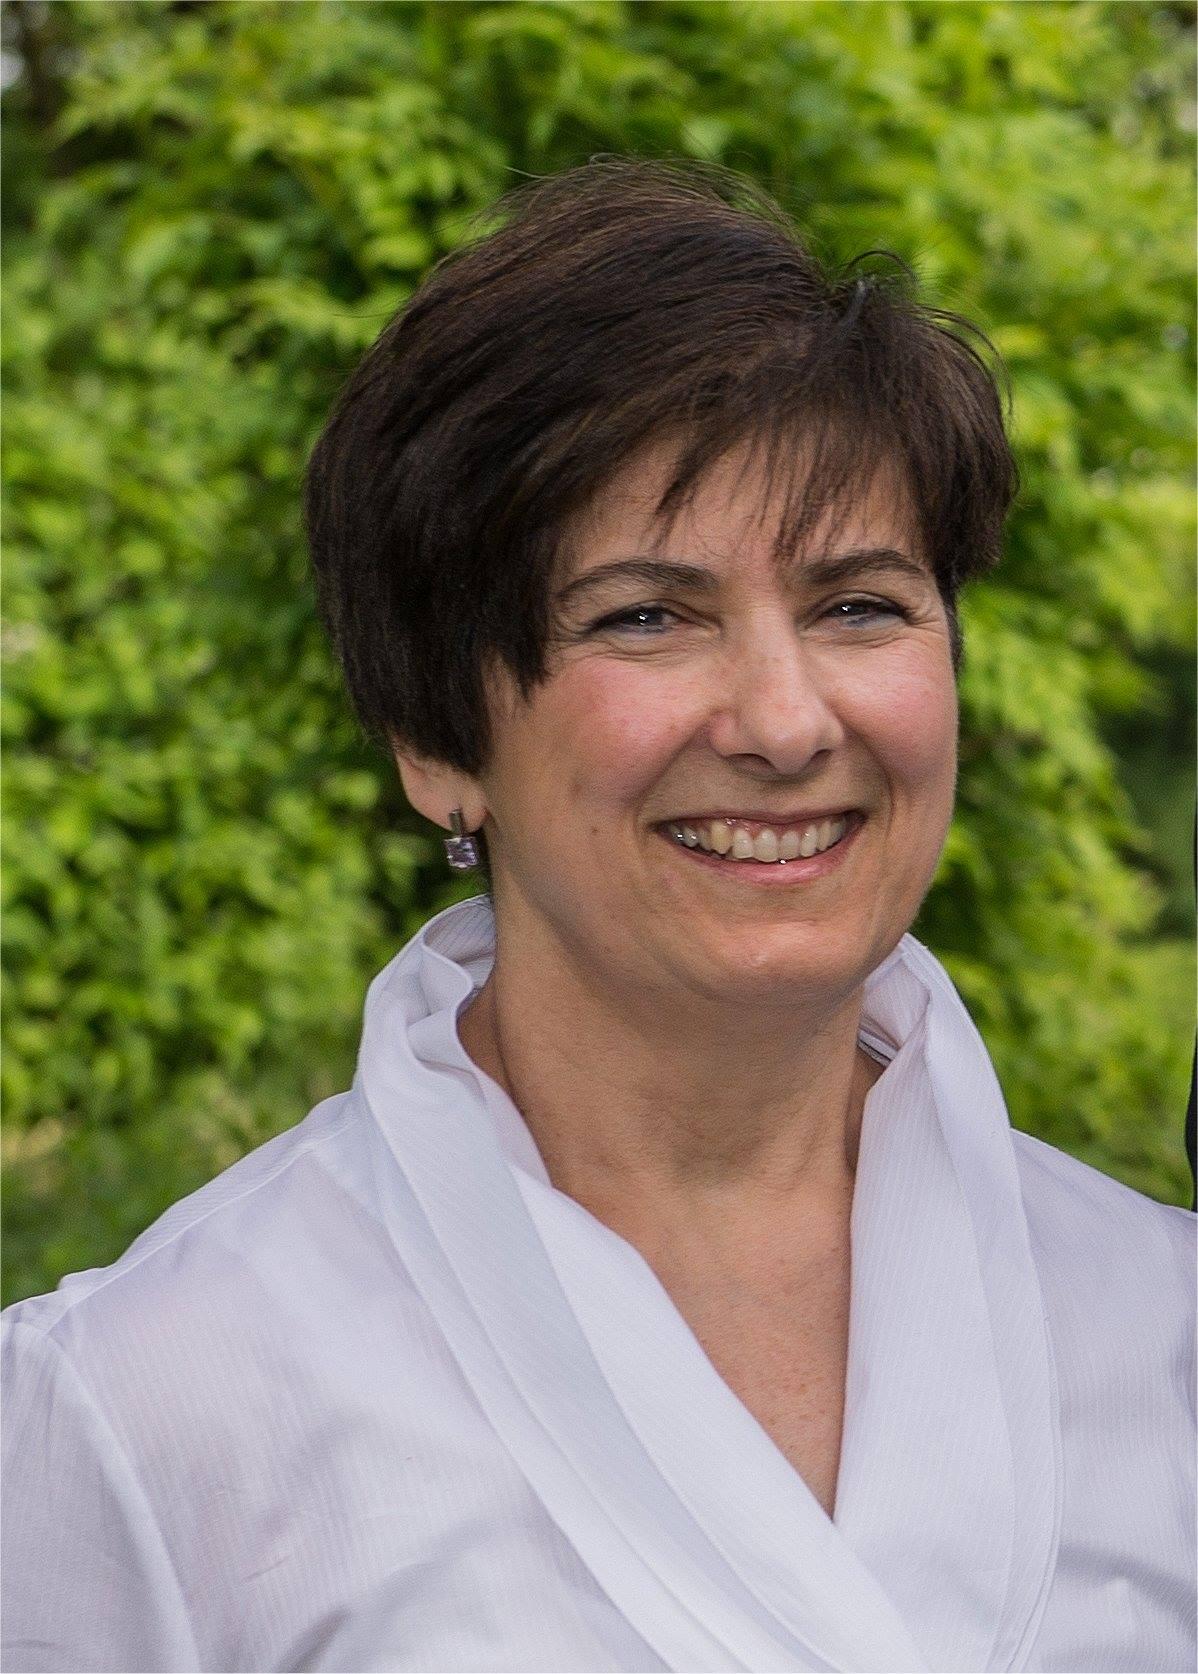 Assessore Cristina Piva